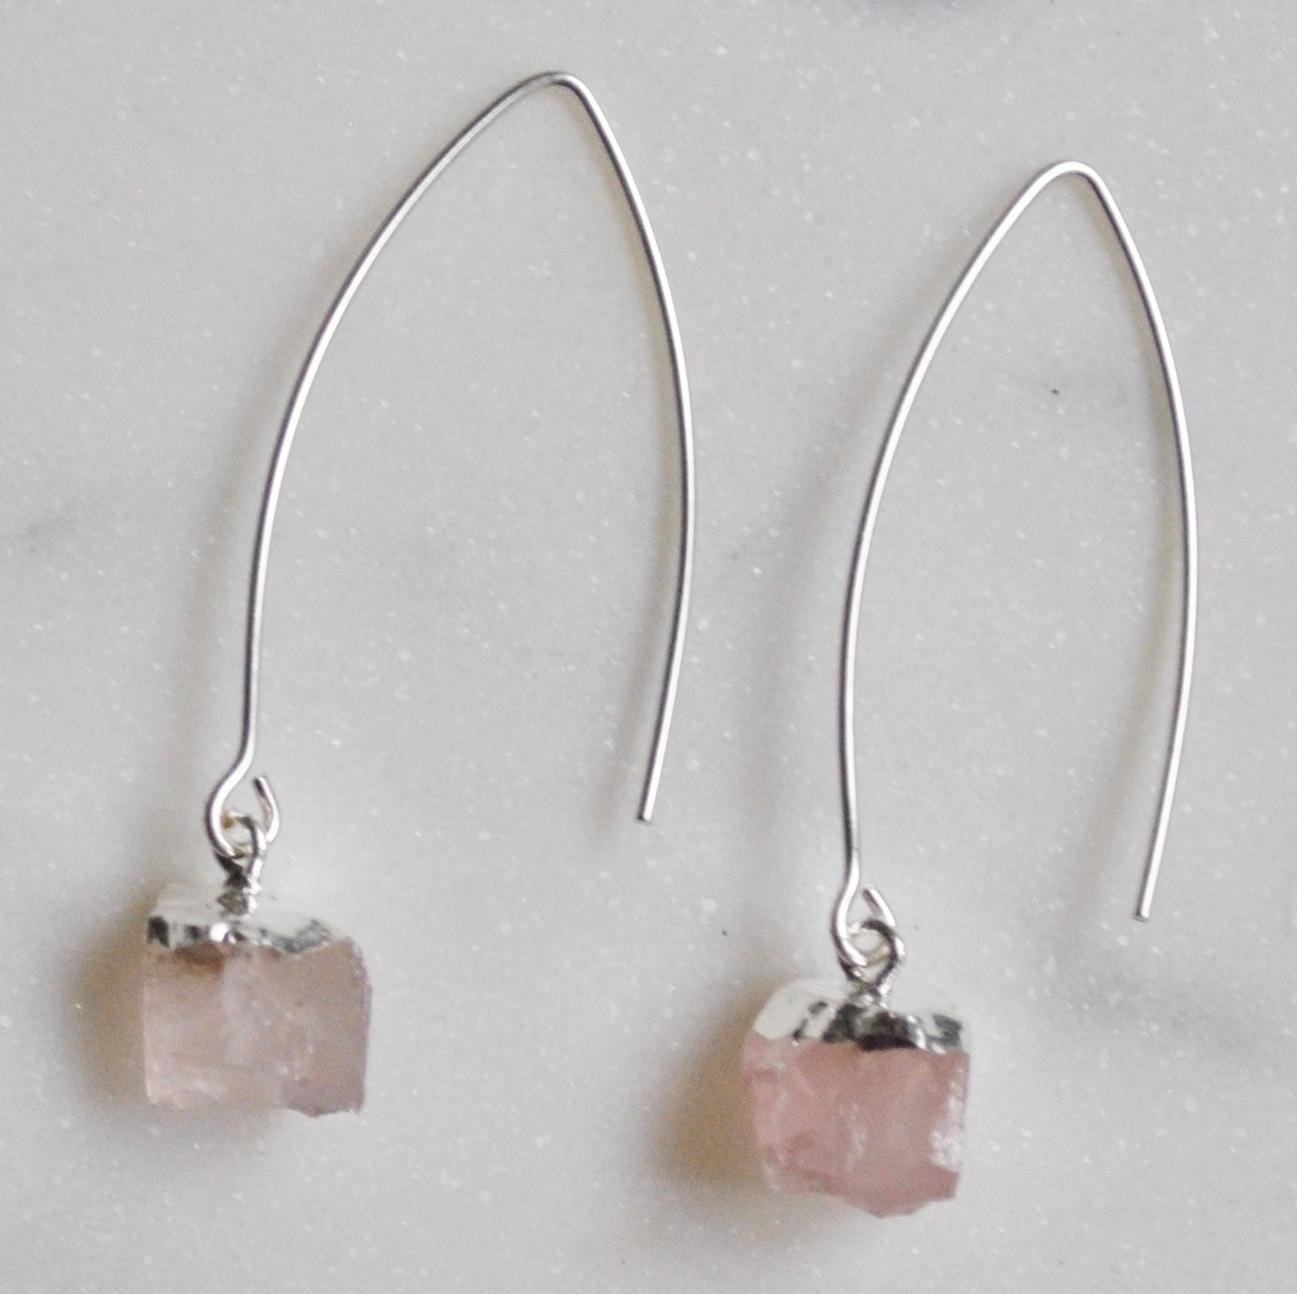 DECADORN Visací náušnice Mini Rose Quartz/Silver, růžová barva, stříbrná barva, kov, kámen